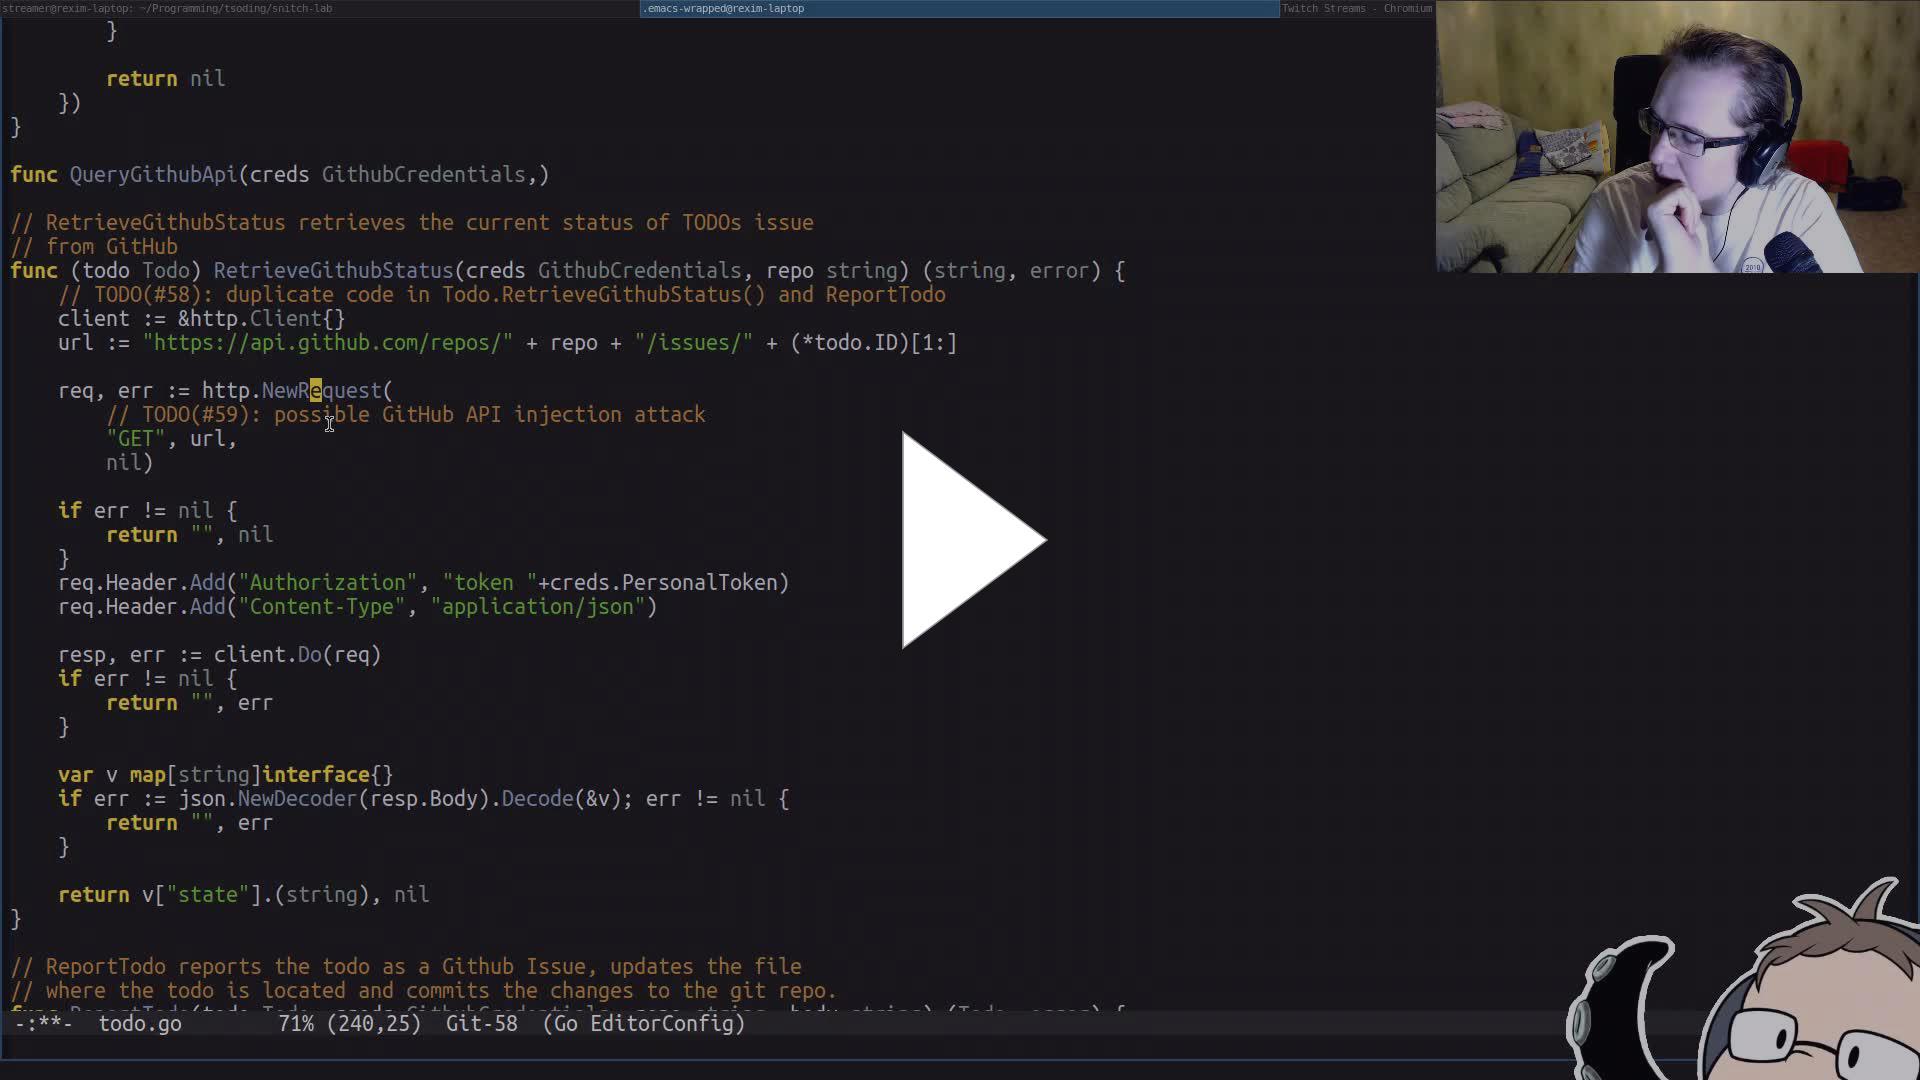 Tsoding - flexible developers - Twitch